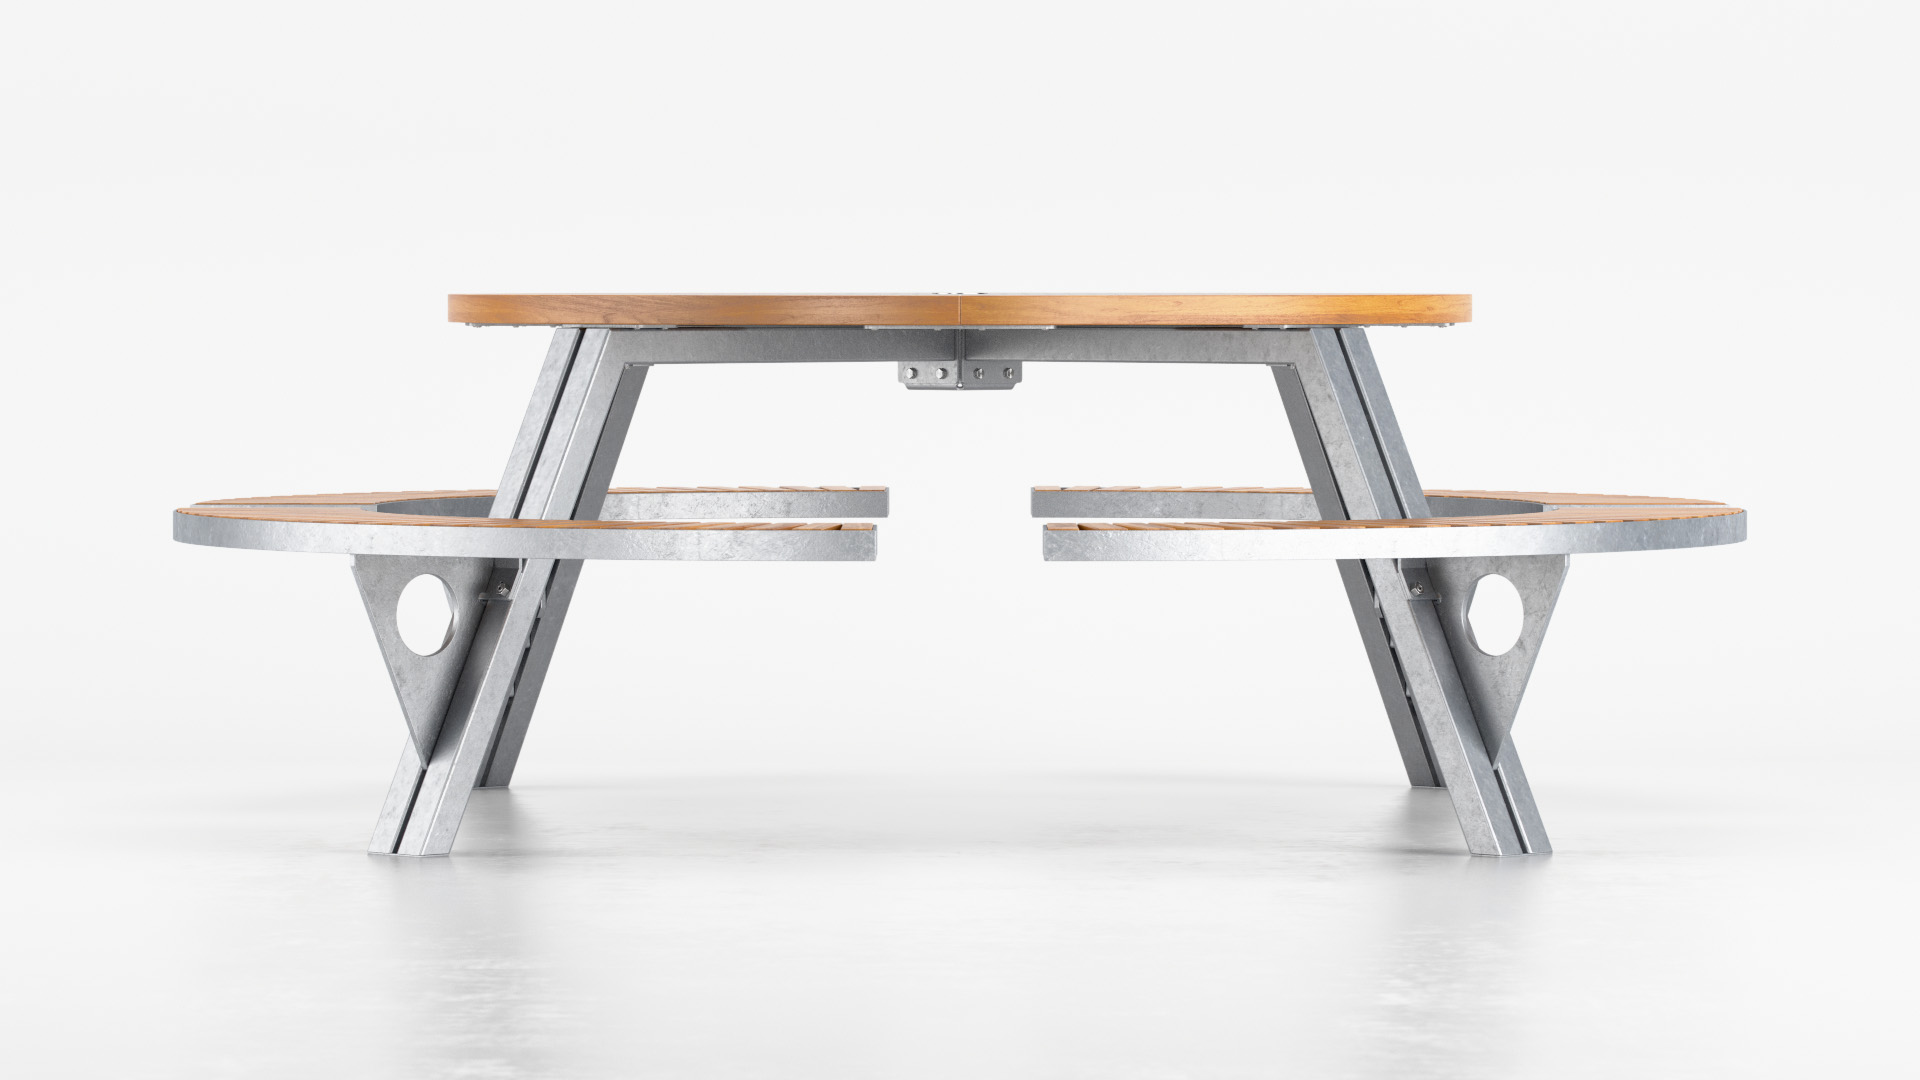 Gargantua_Table_Mode1_WhiteSet_01_0002